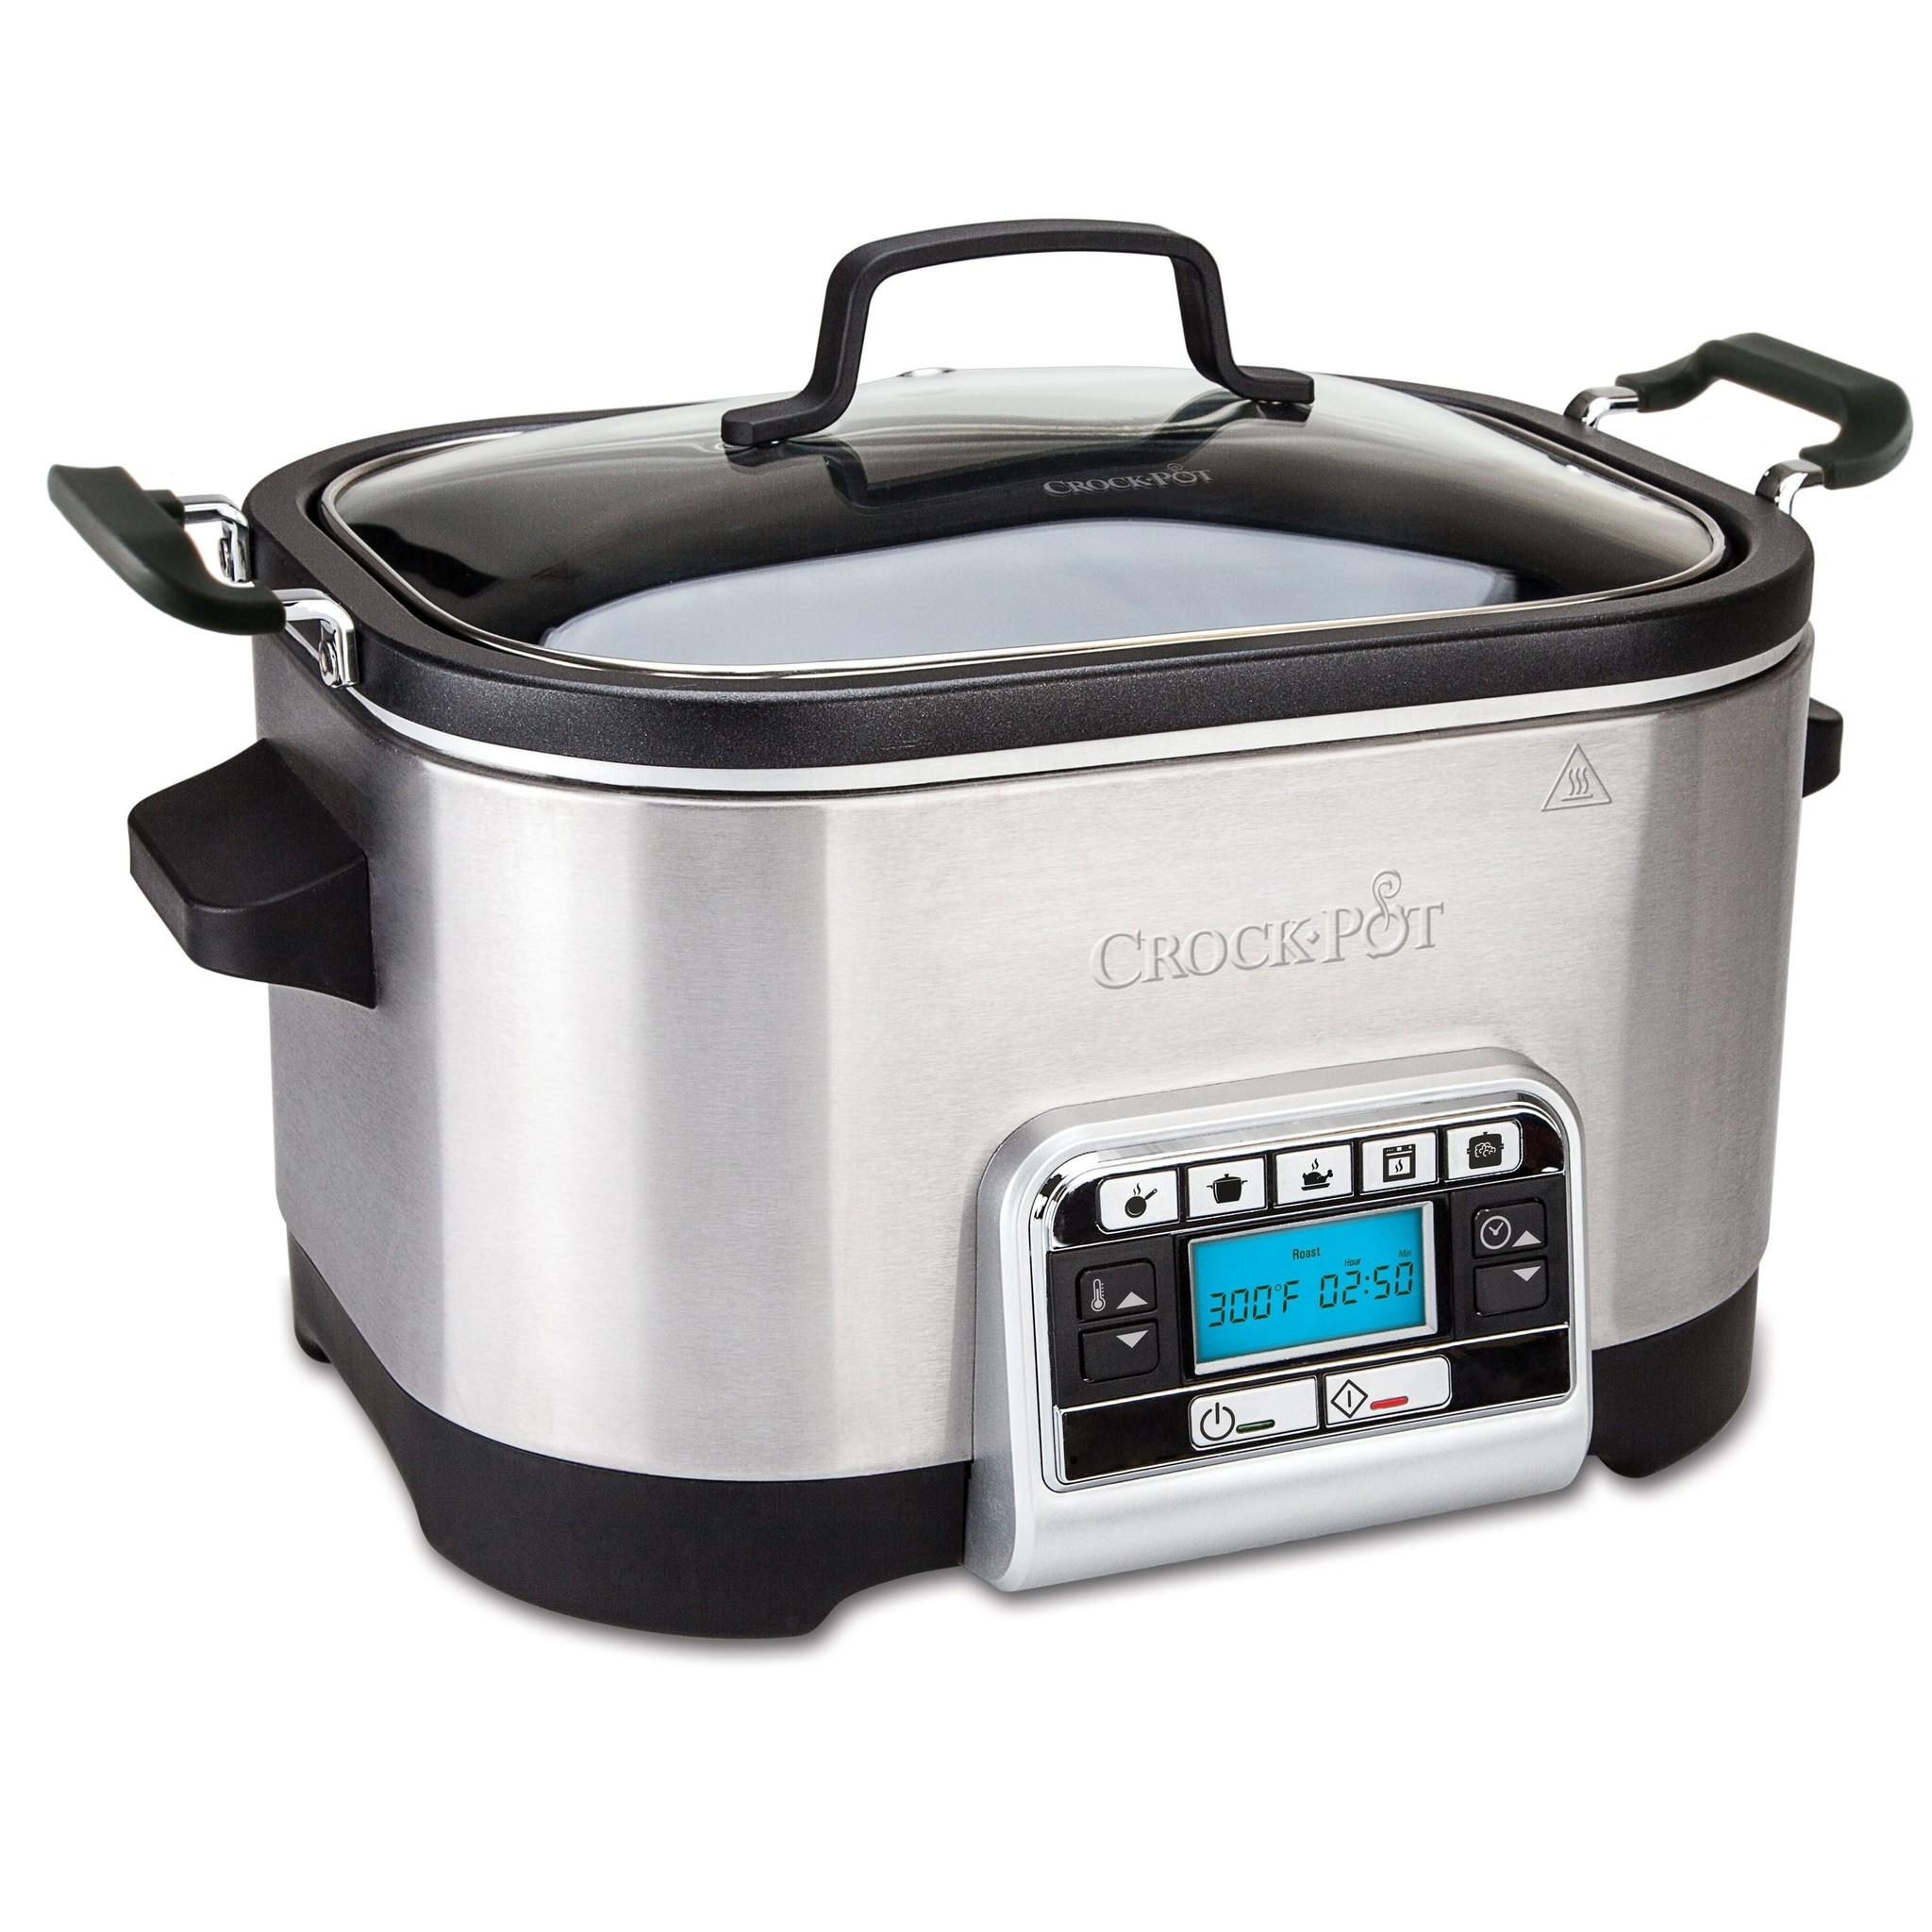 Crock-Pot CR024 slow/multicooker